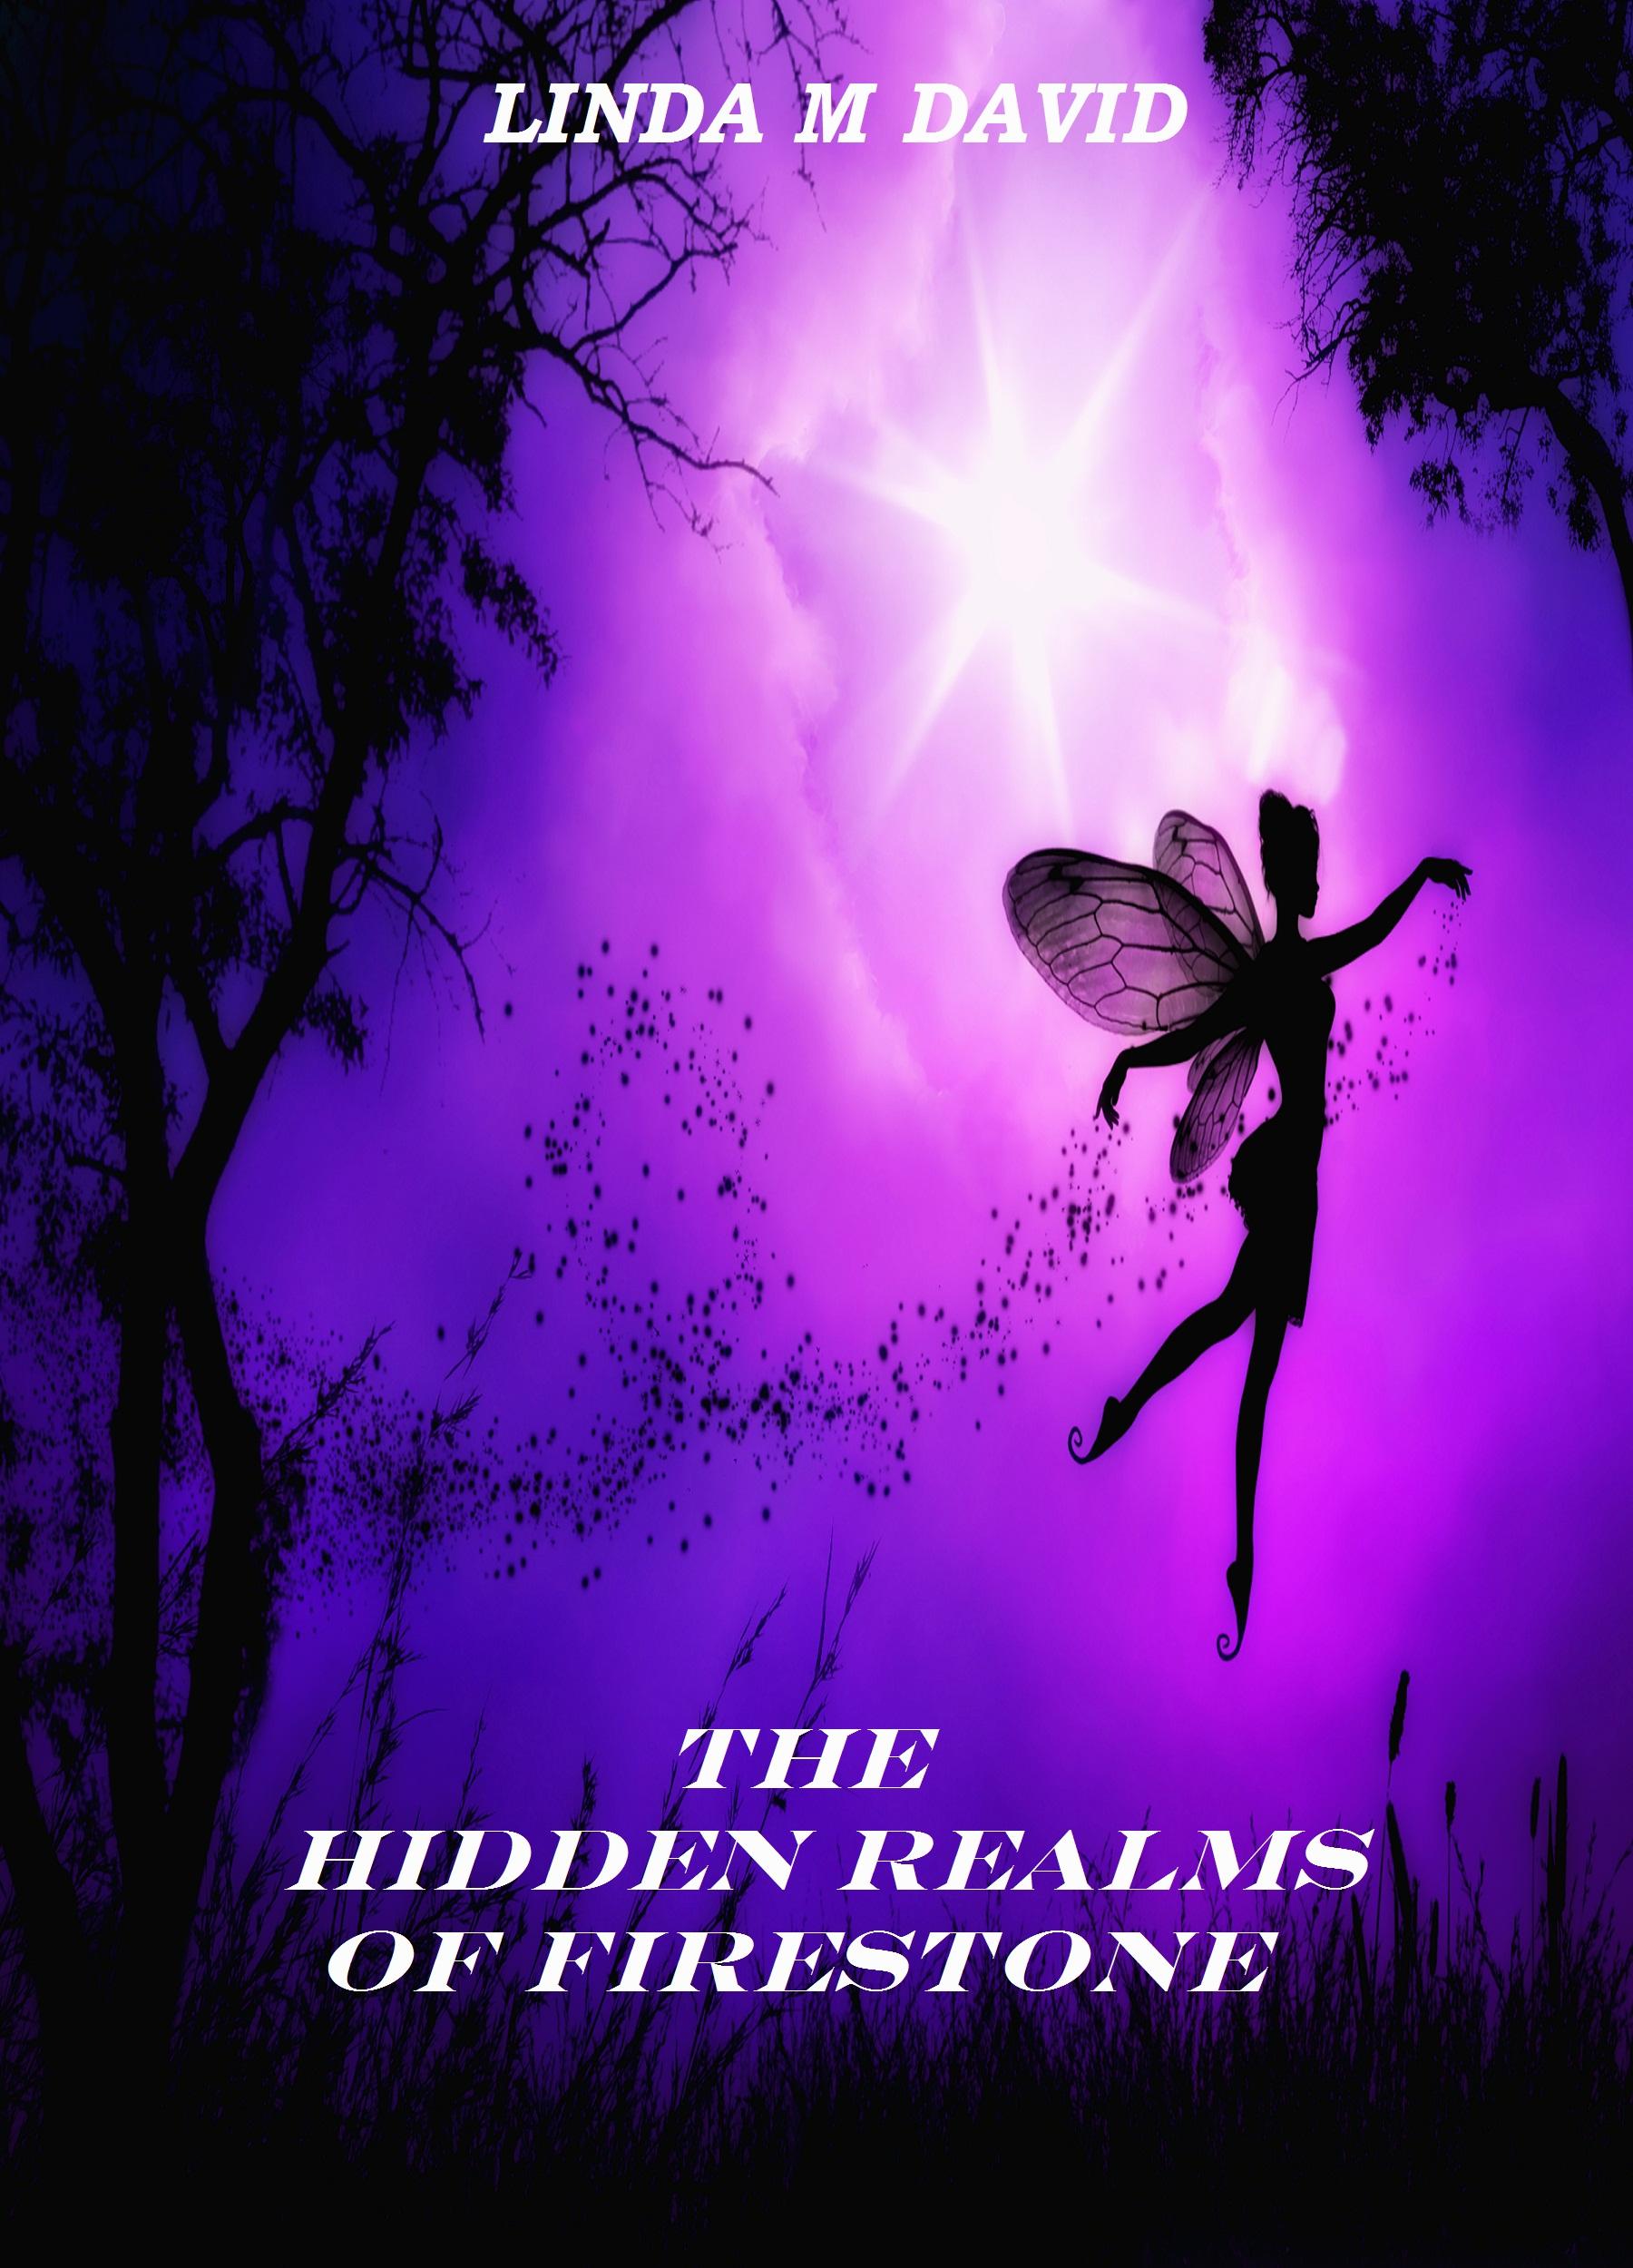 The Hidden Realms of Firestone